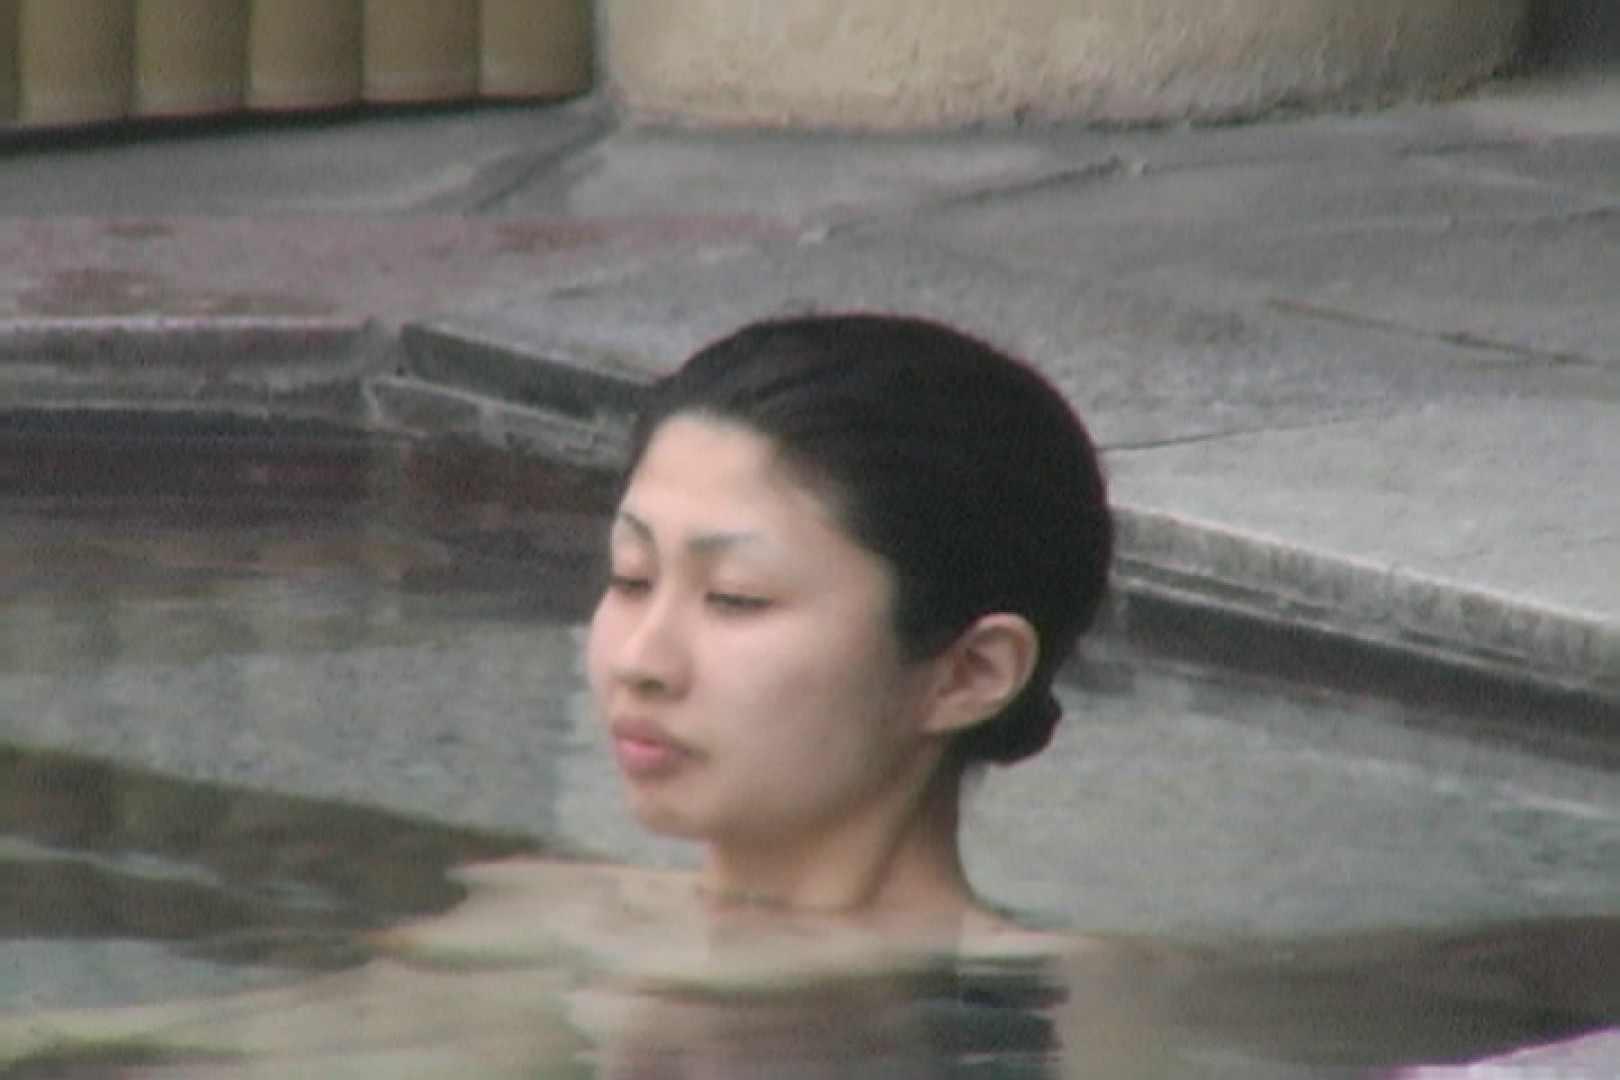 Aquaな露天風呂Vol.642 美しいOLの裸体 | 露天風呂突入  86pic 64